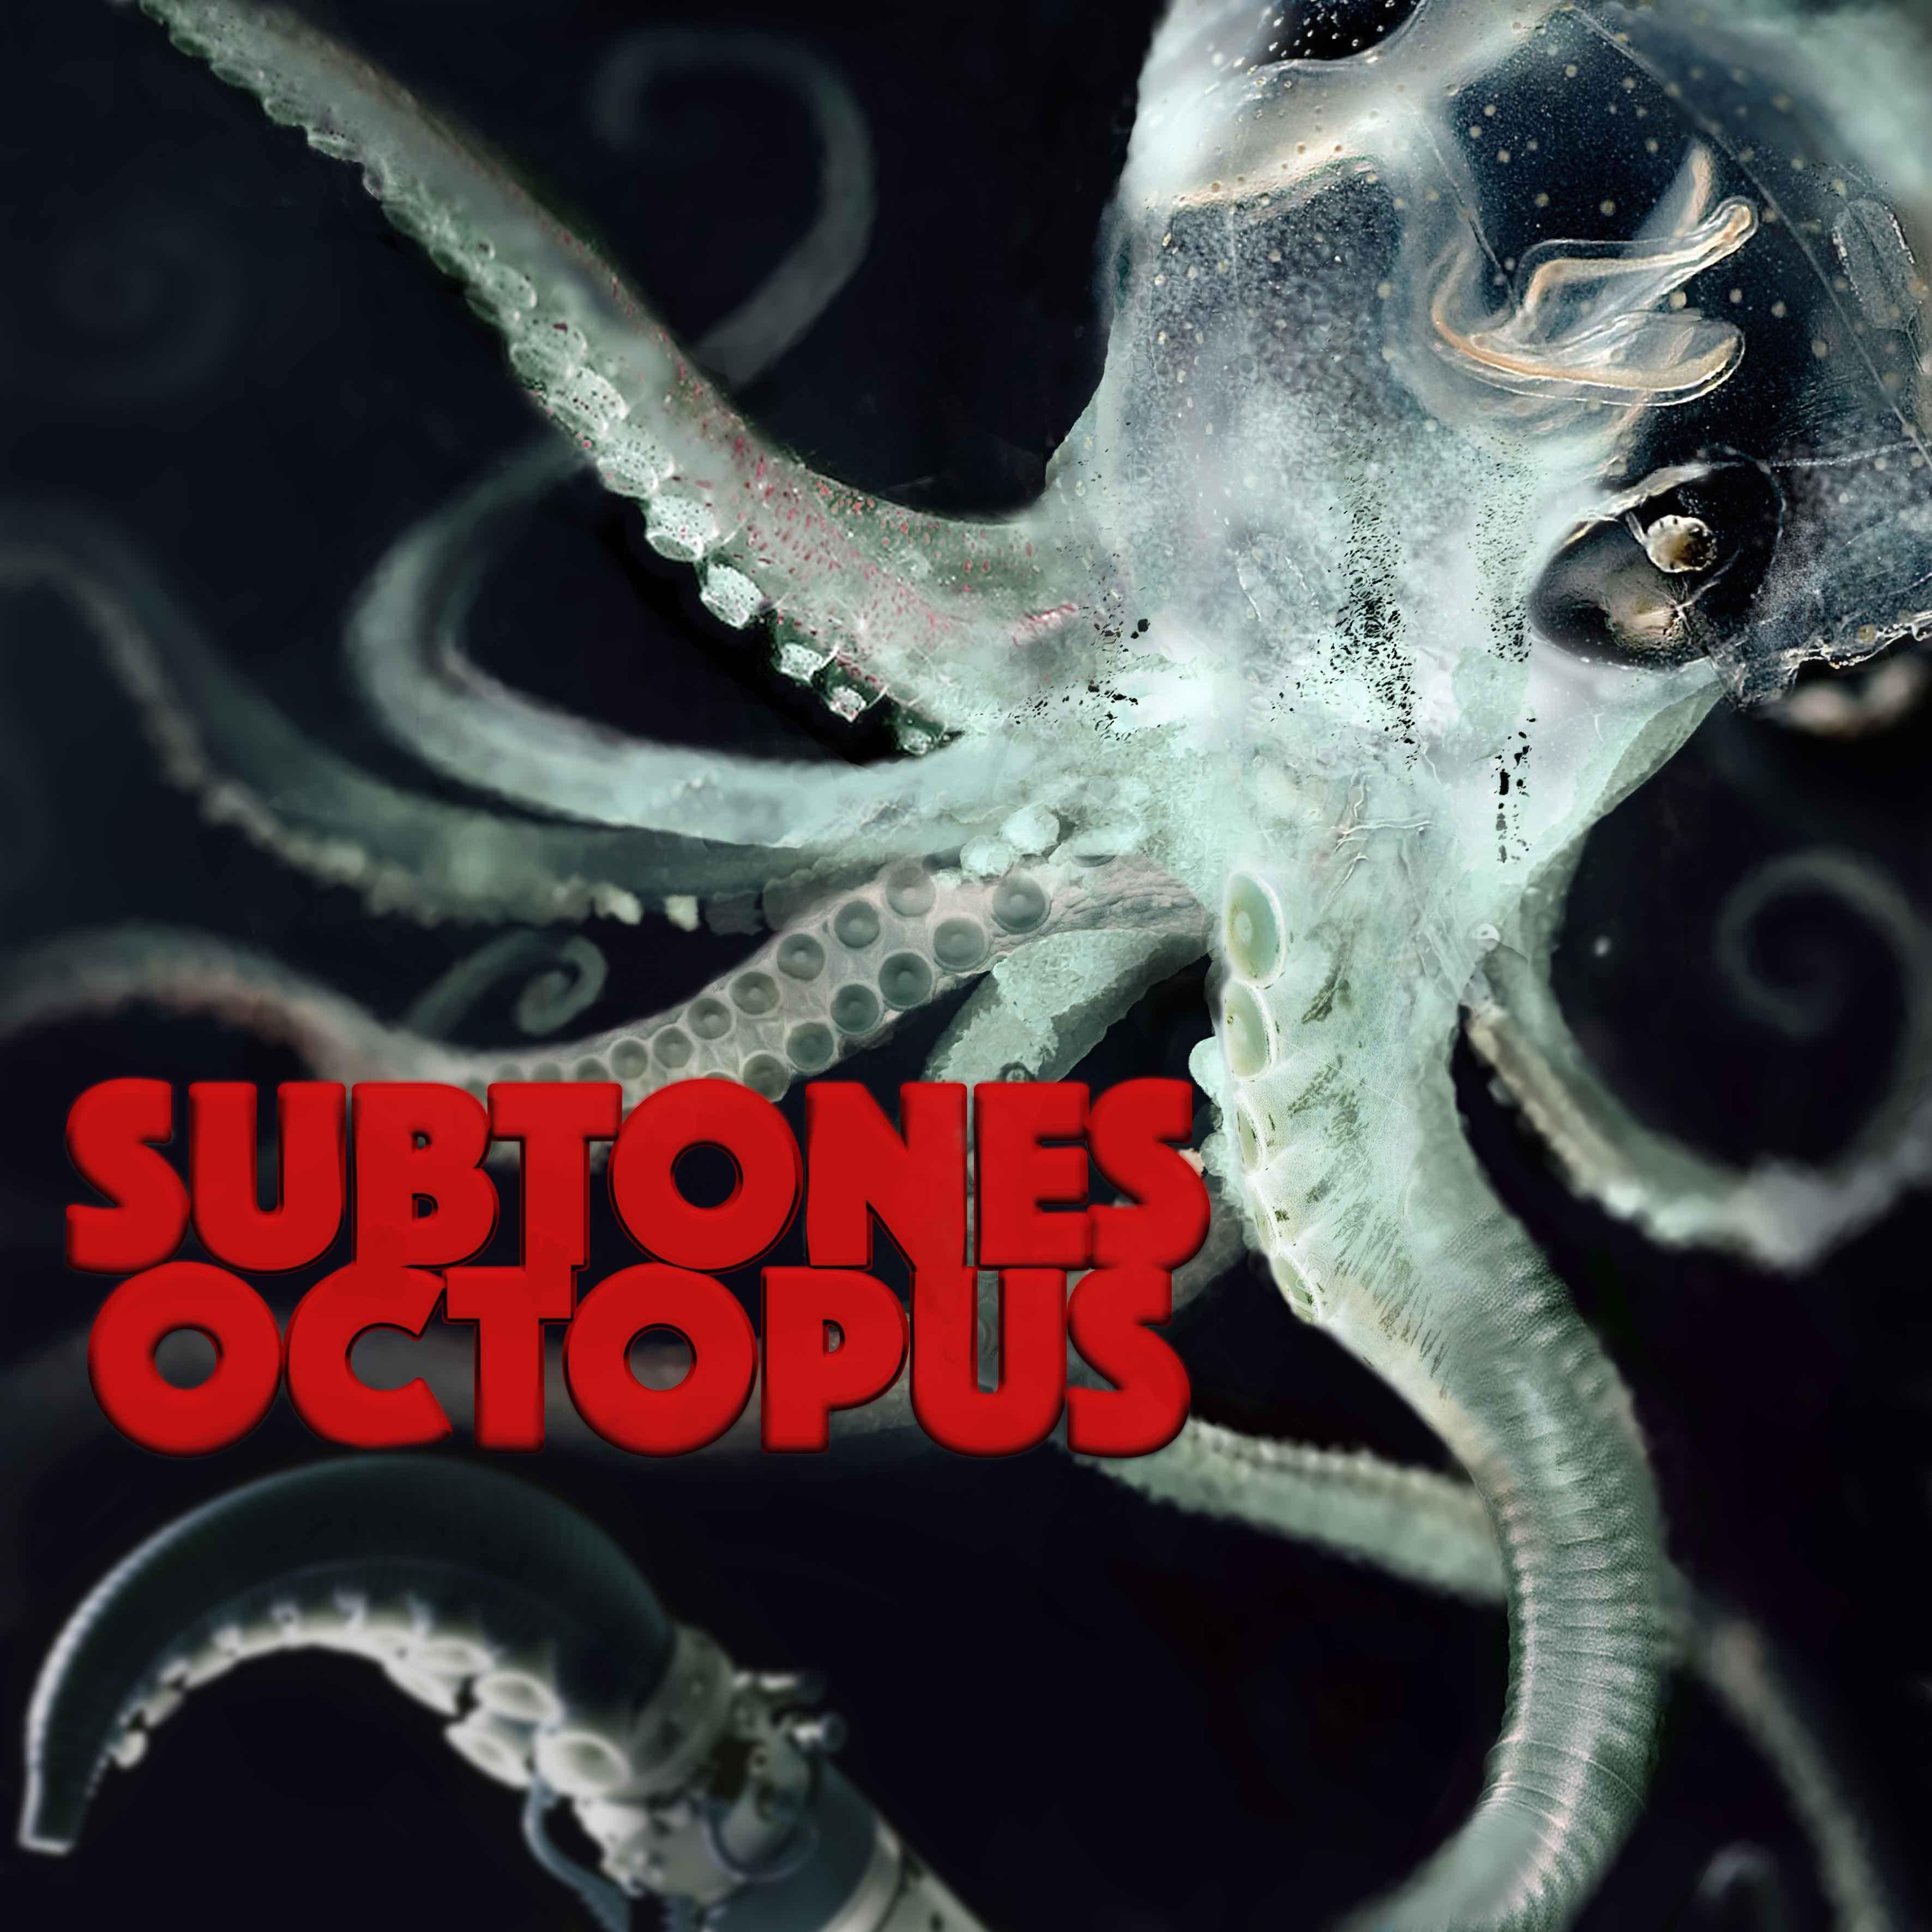 octopus_cover.jpg